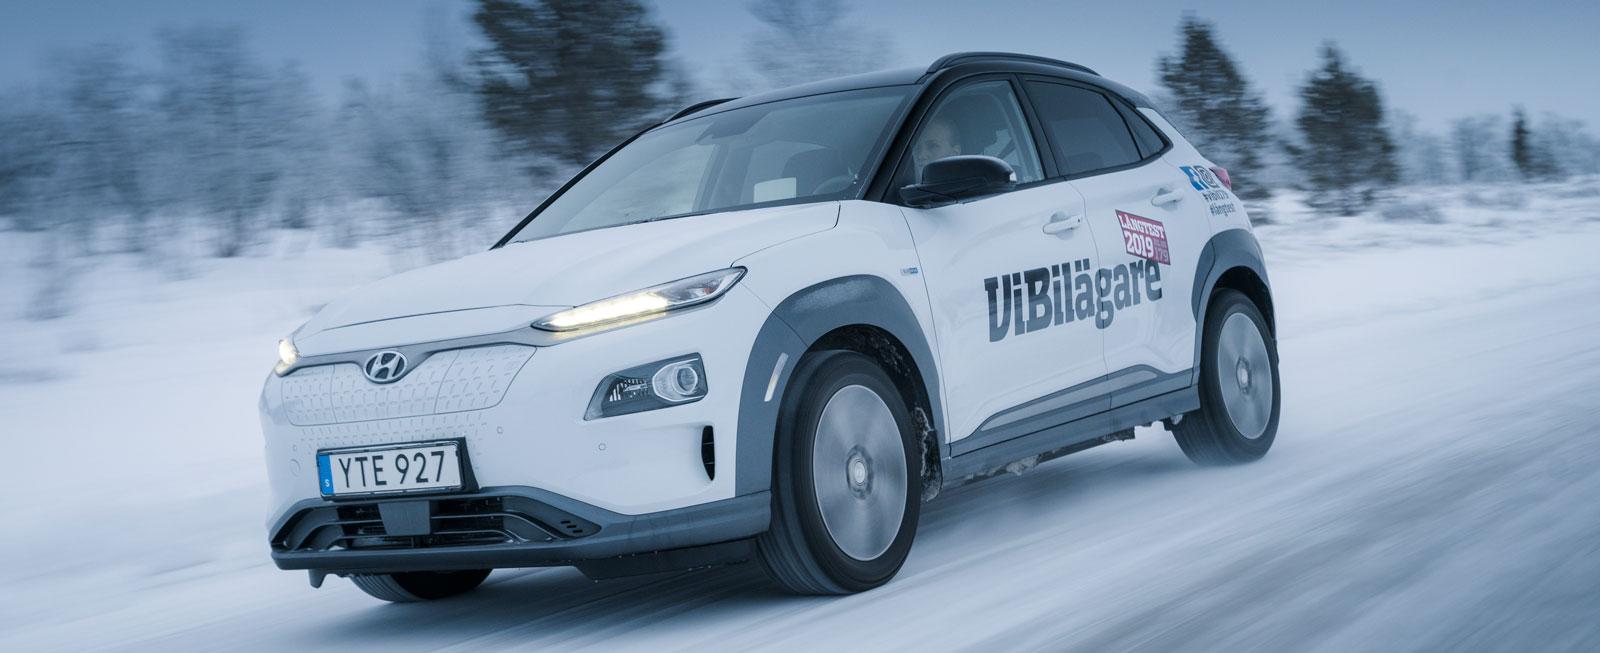 Vintertest 2019: Audi A6, Dacia Duster, Ford Focus, Hyundai Kona Electric & Volvo V60 (2019)